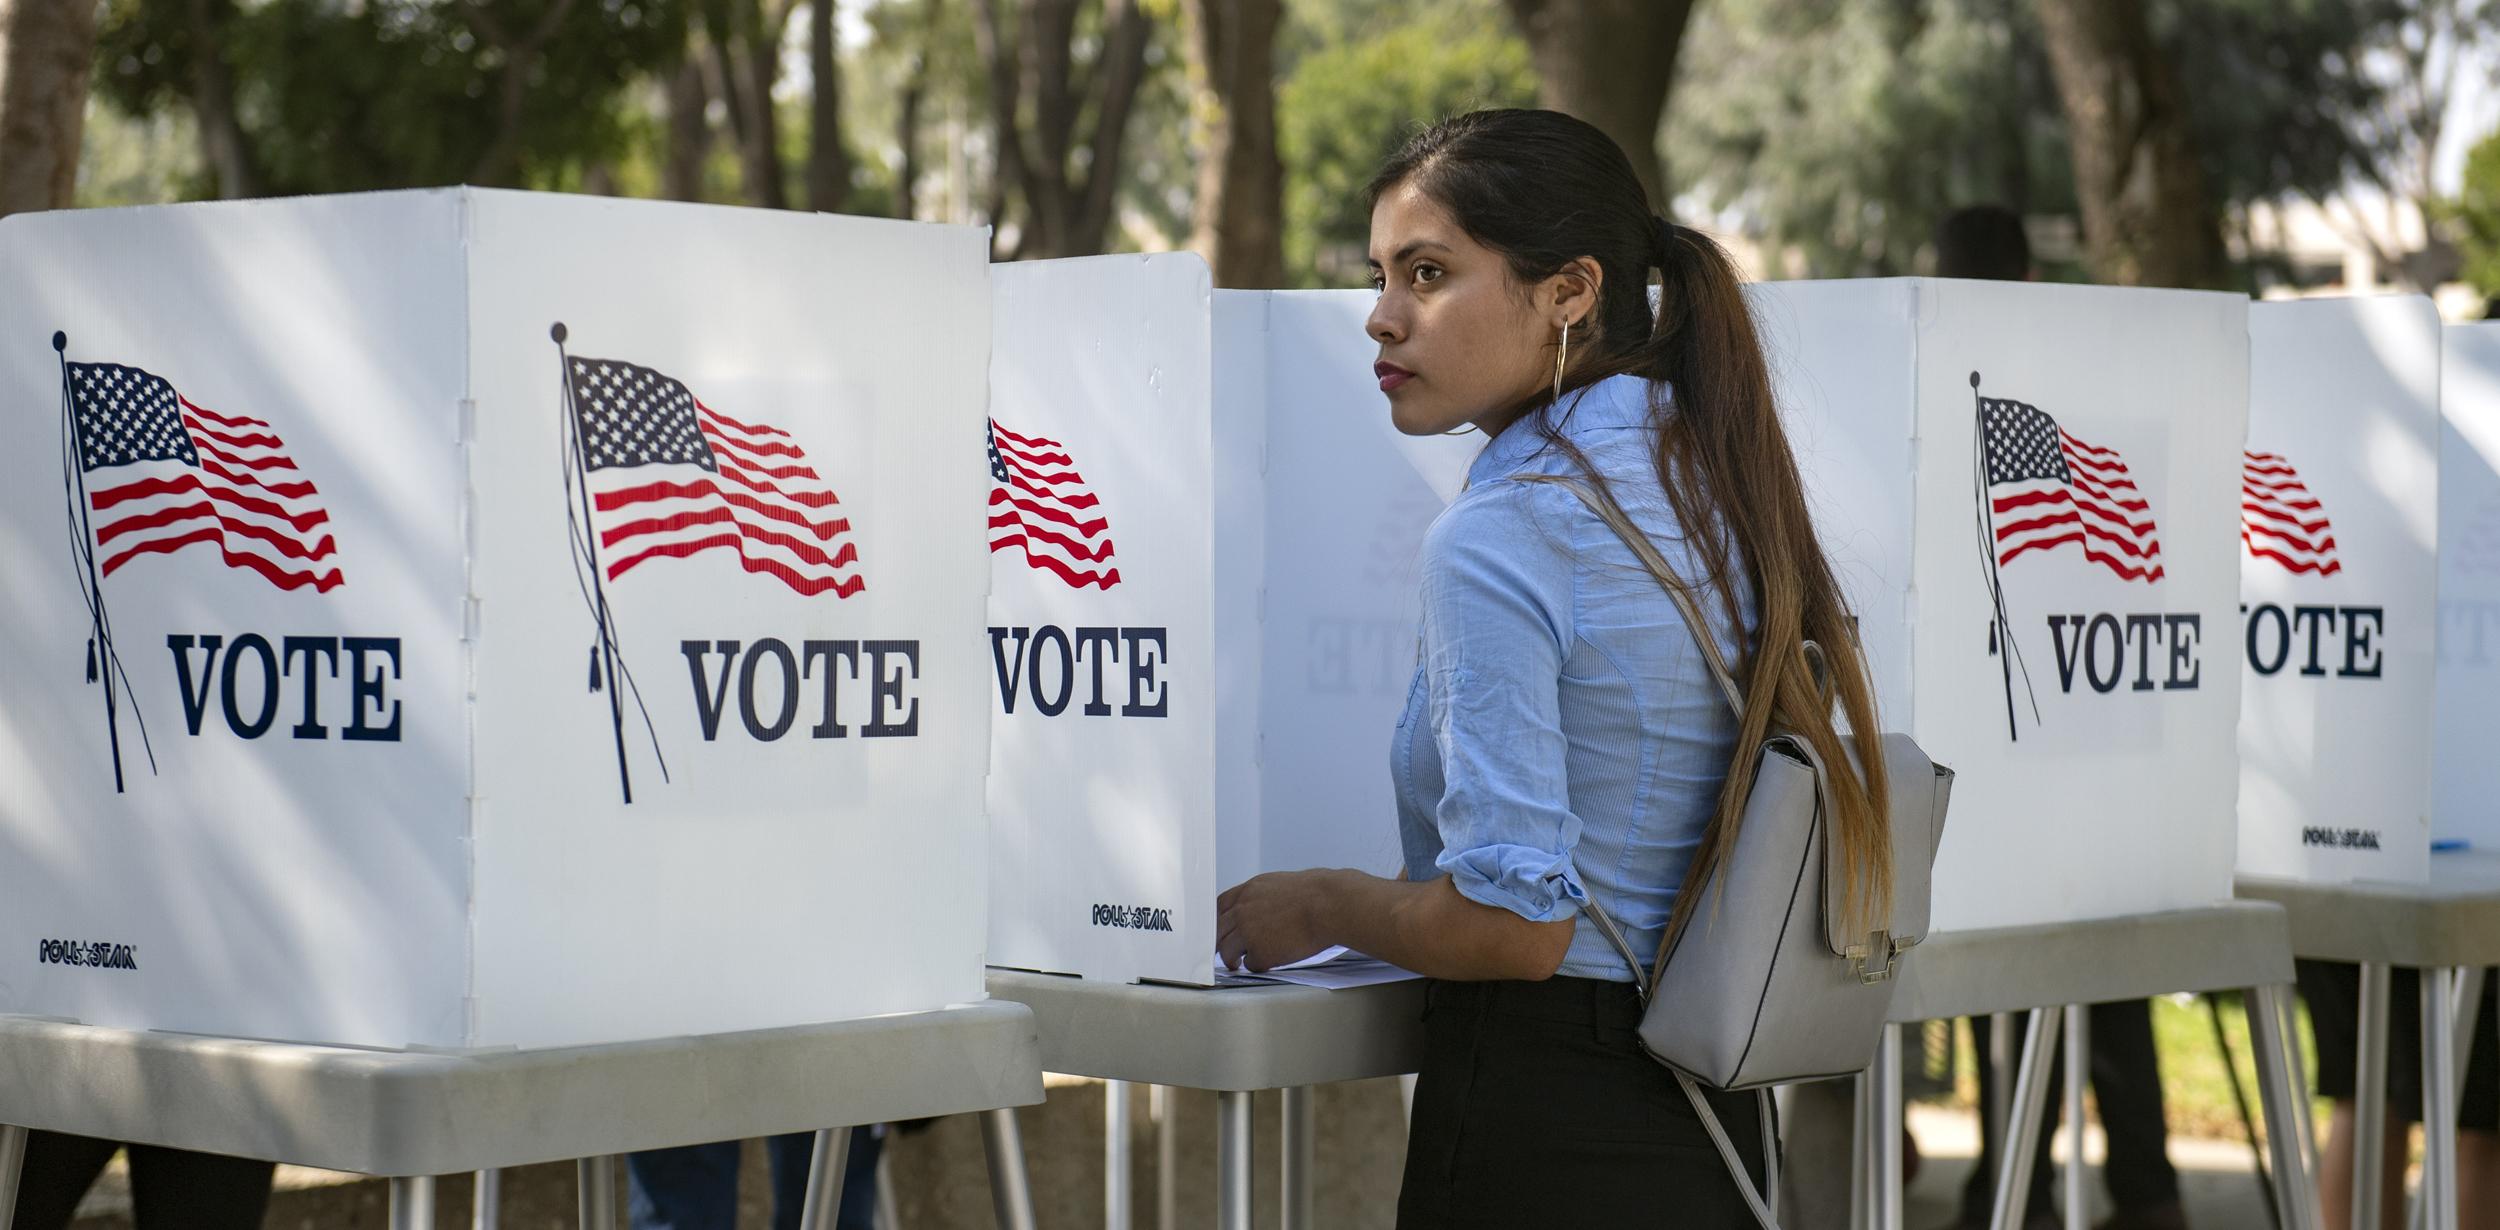 Among-Democratic-presidential-campaigns,-a-more-visible-Latino-presence